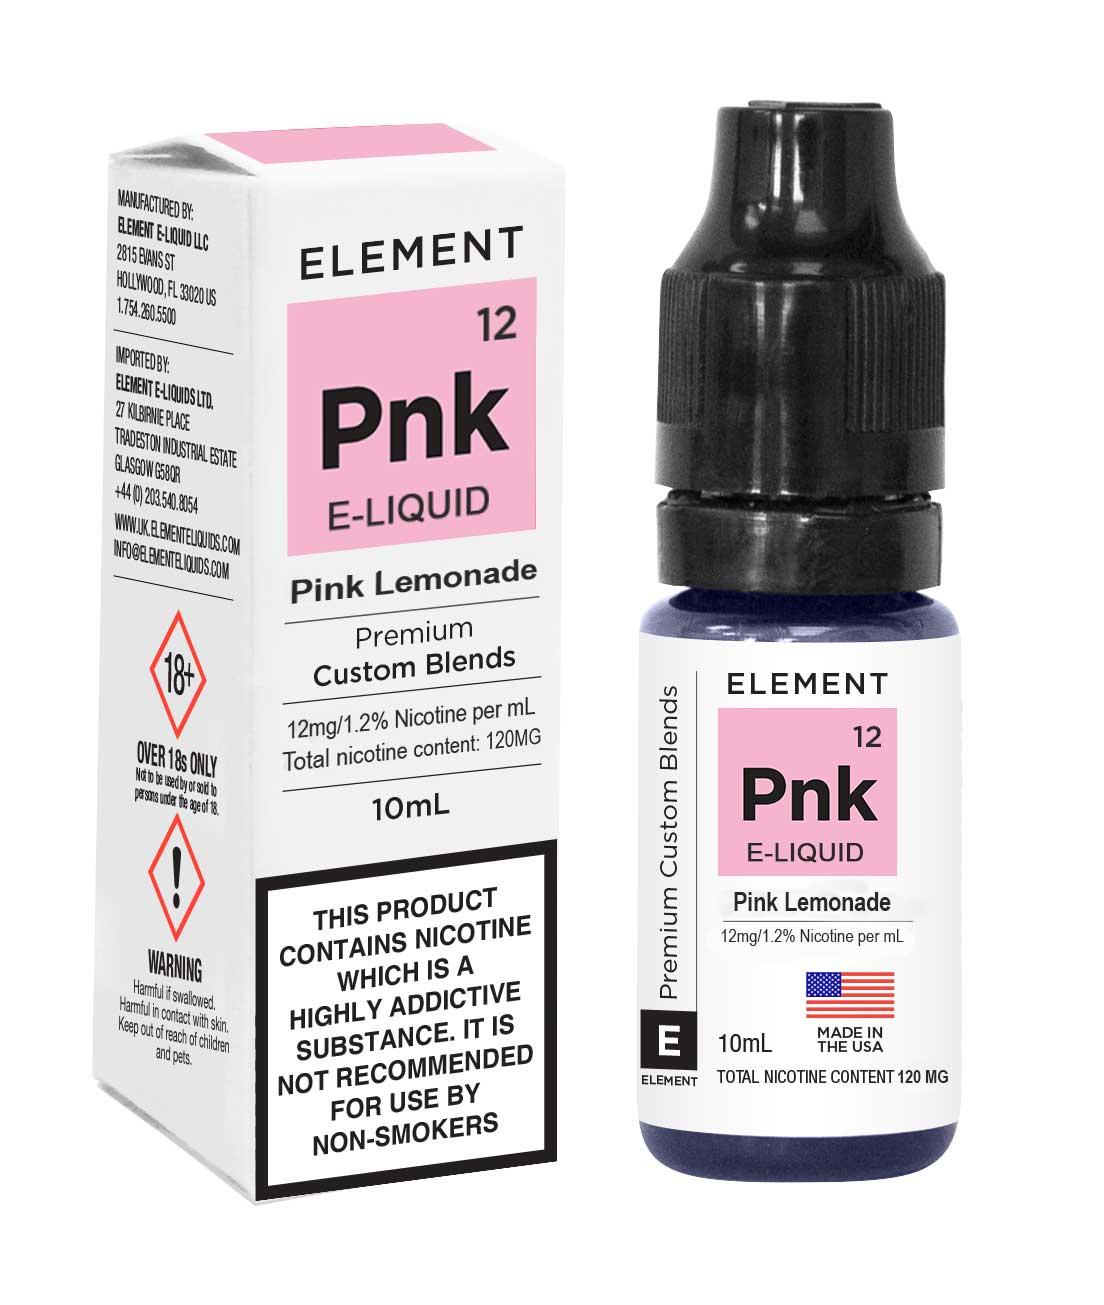 Compare prices for Element E-liquid Pink Lemonade 10ml - 12mg Nicotine